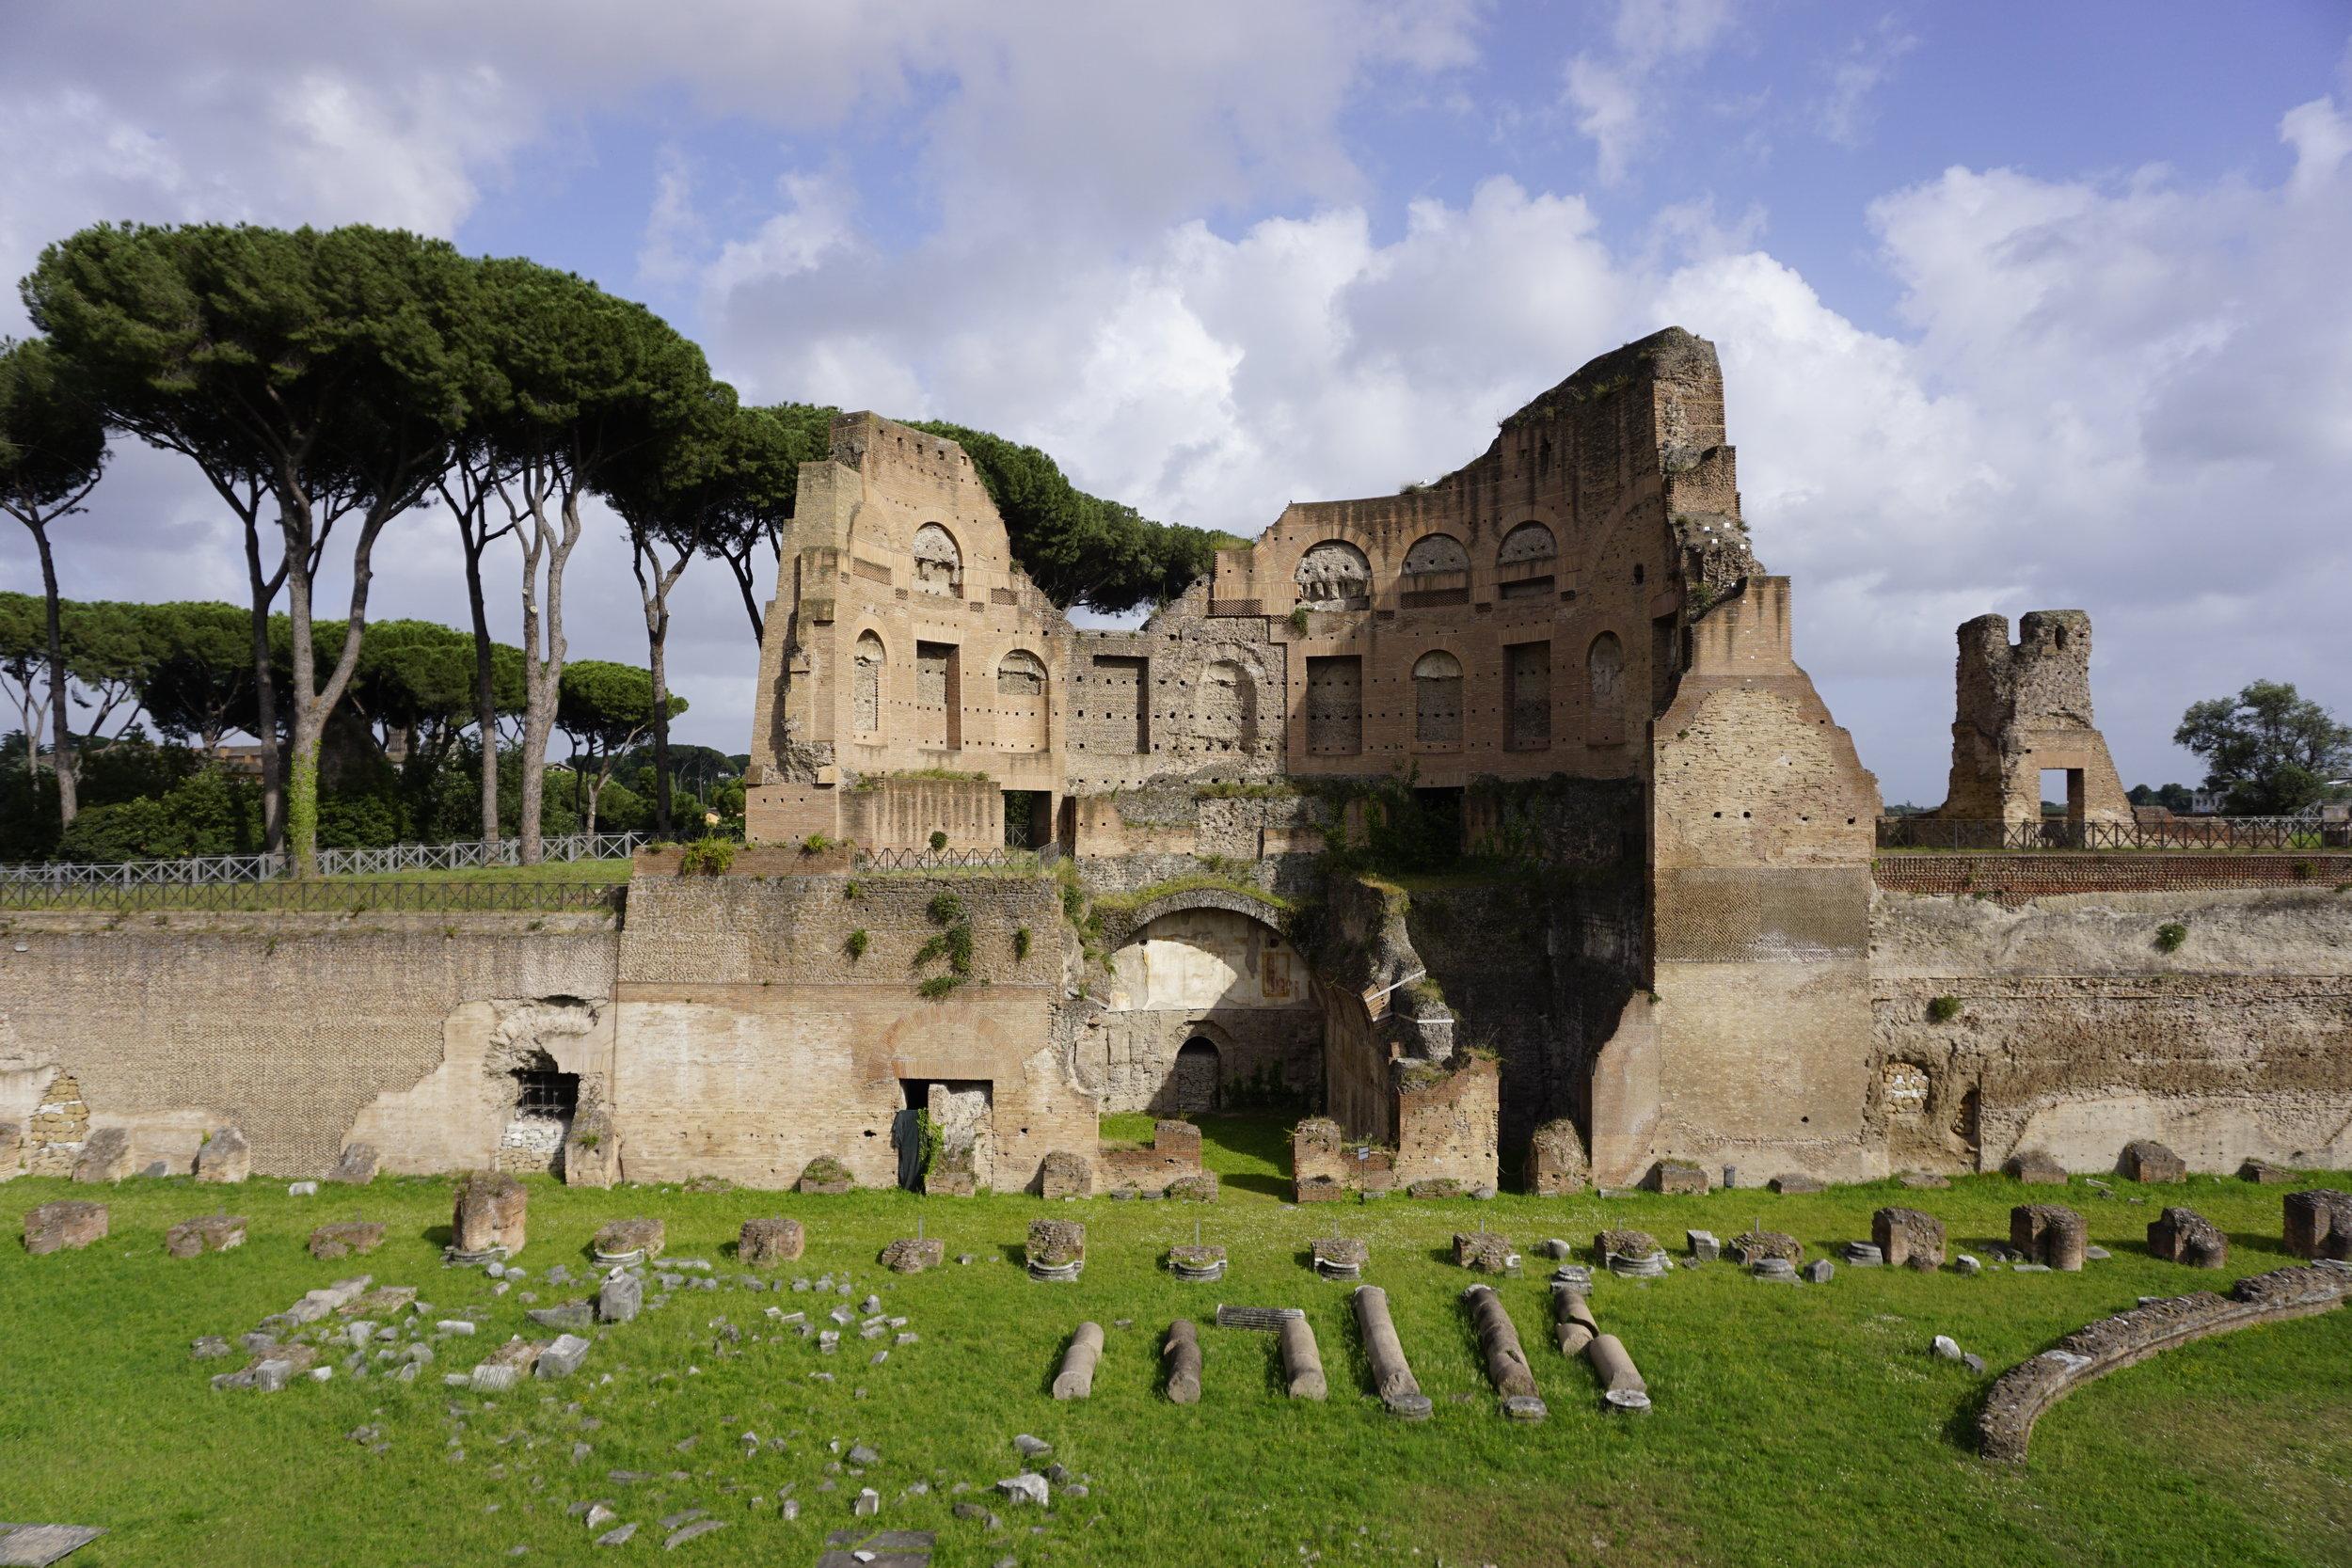 The Roman Forum© 2016 David Harrop